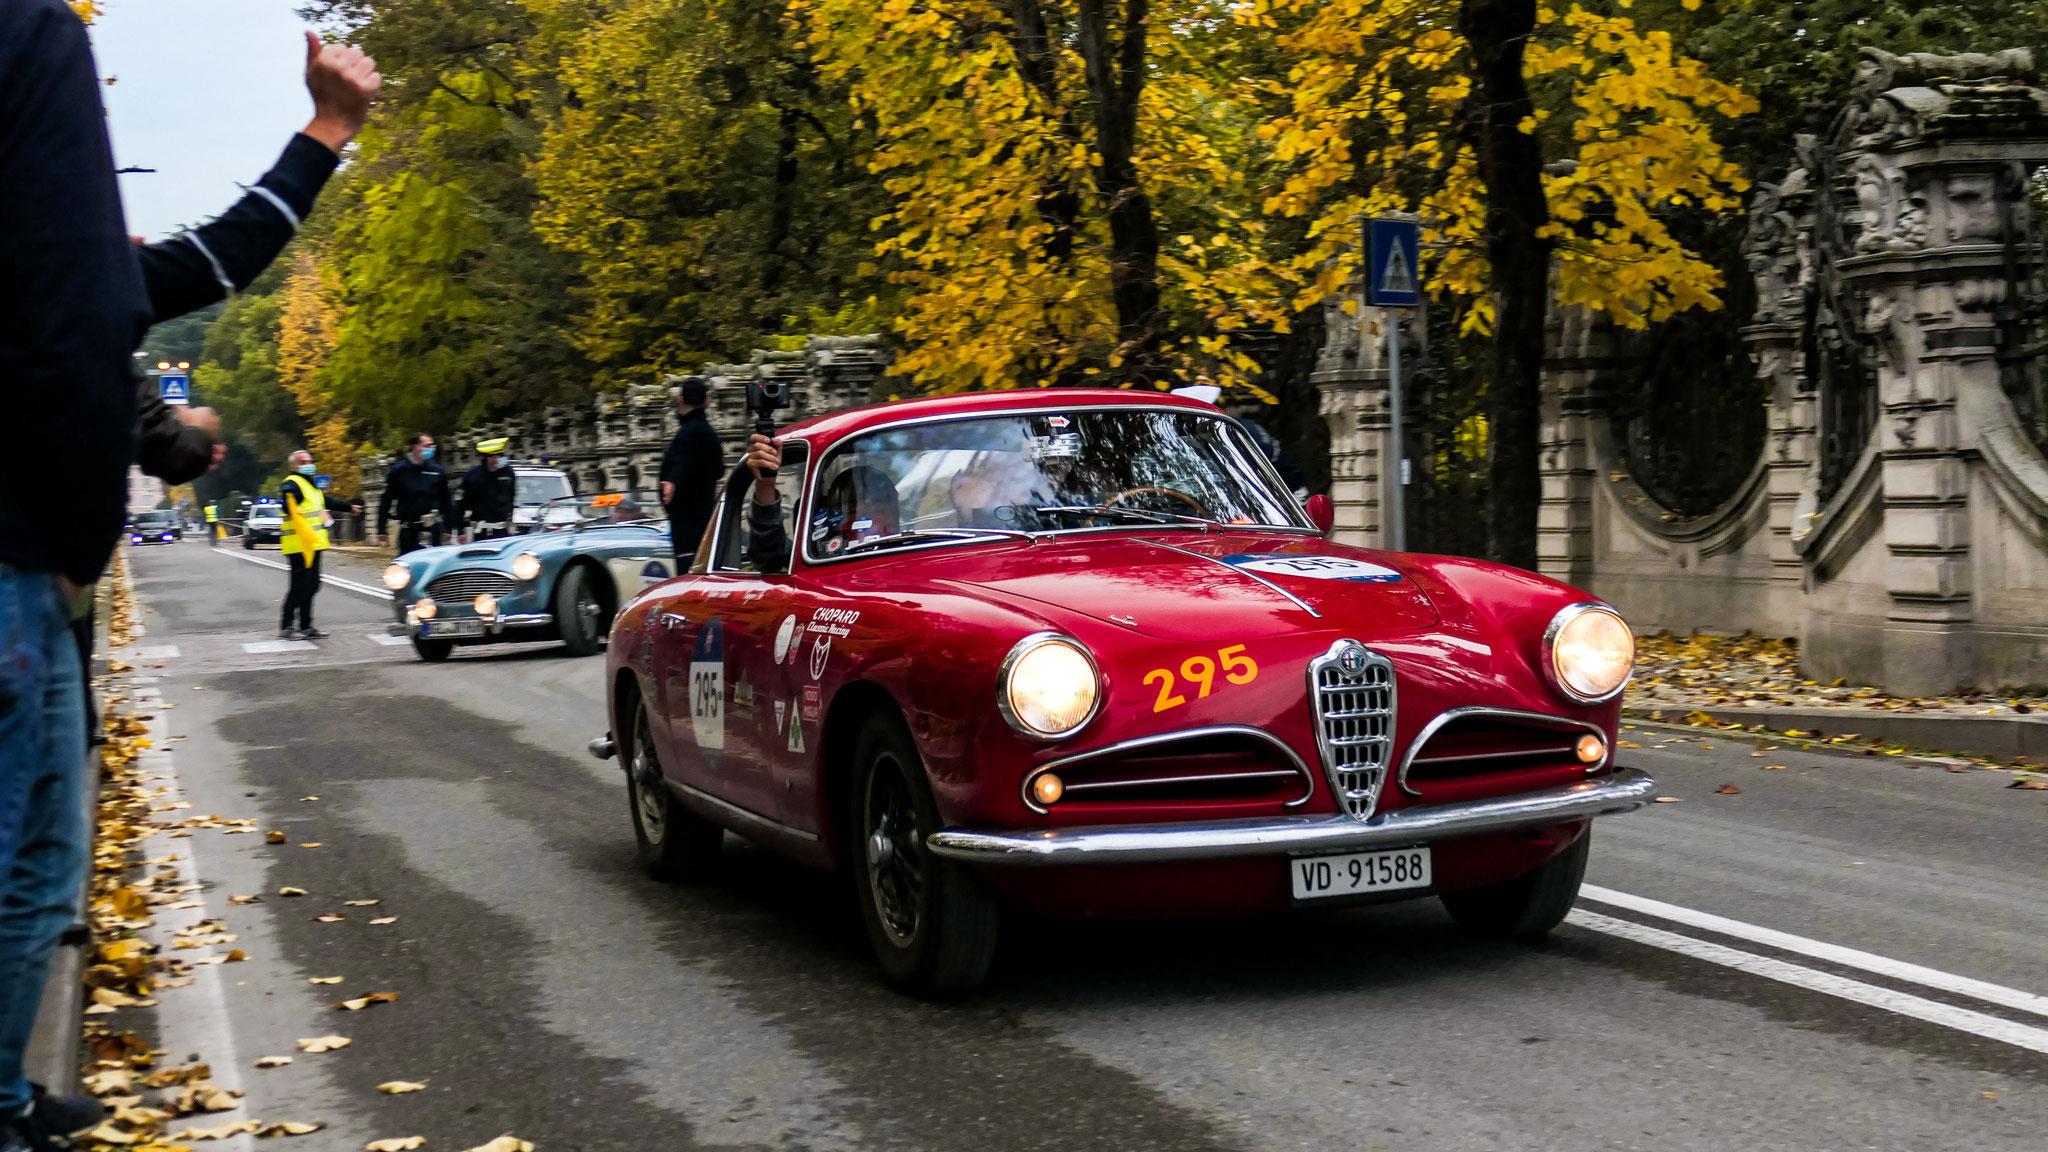 Alfa Romeo 1900C Super Sprint Touring - VD-91588 (CH)